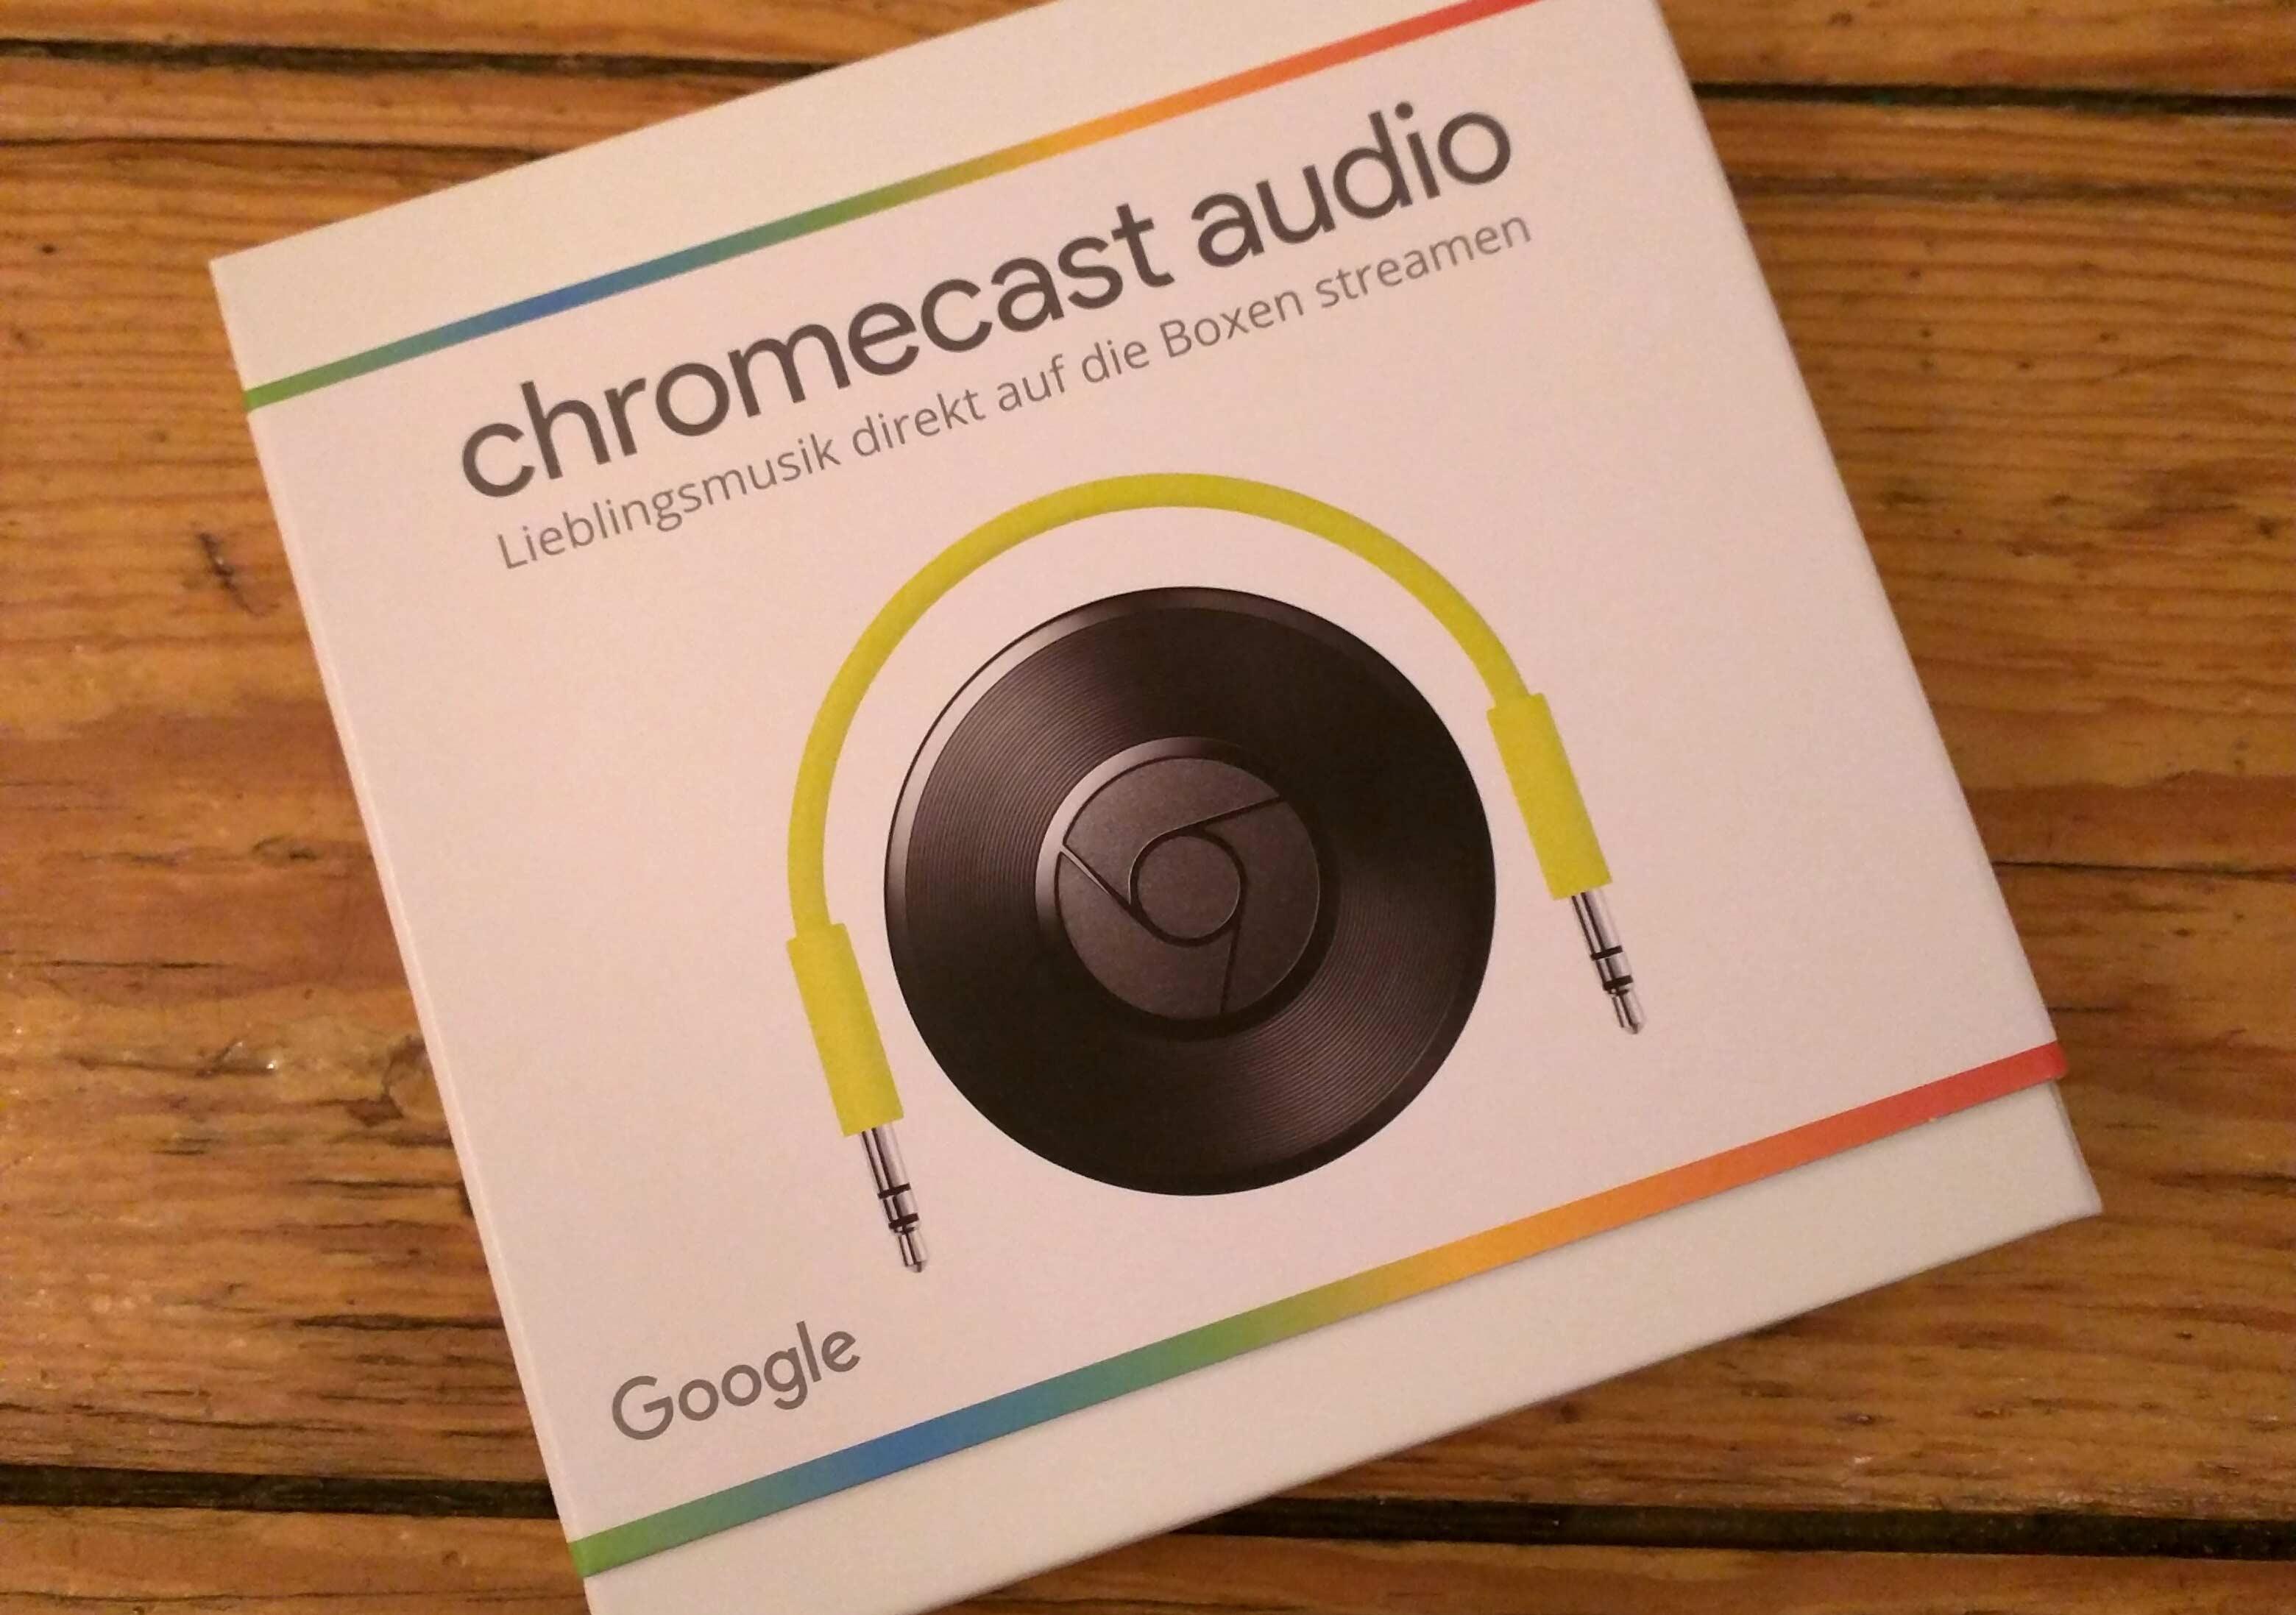 Google Chromecast Audio: Verpackung